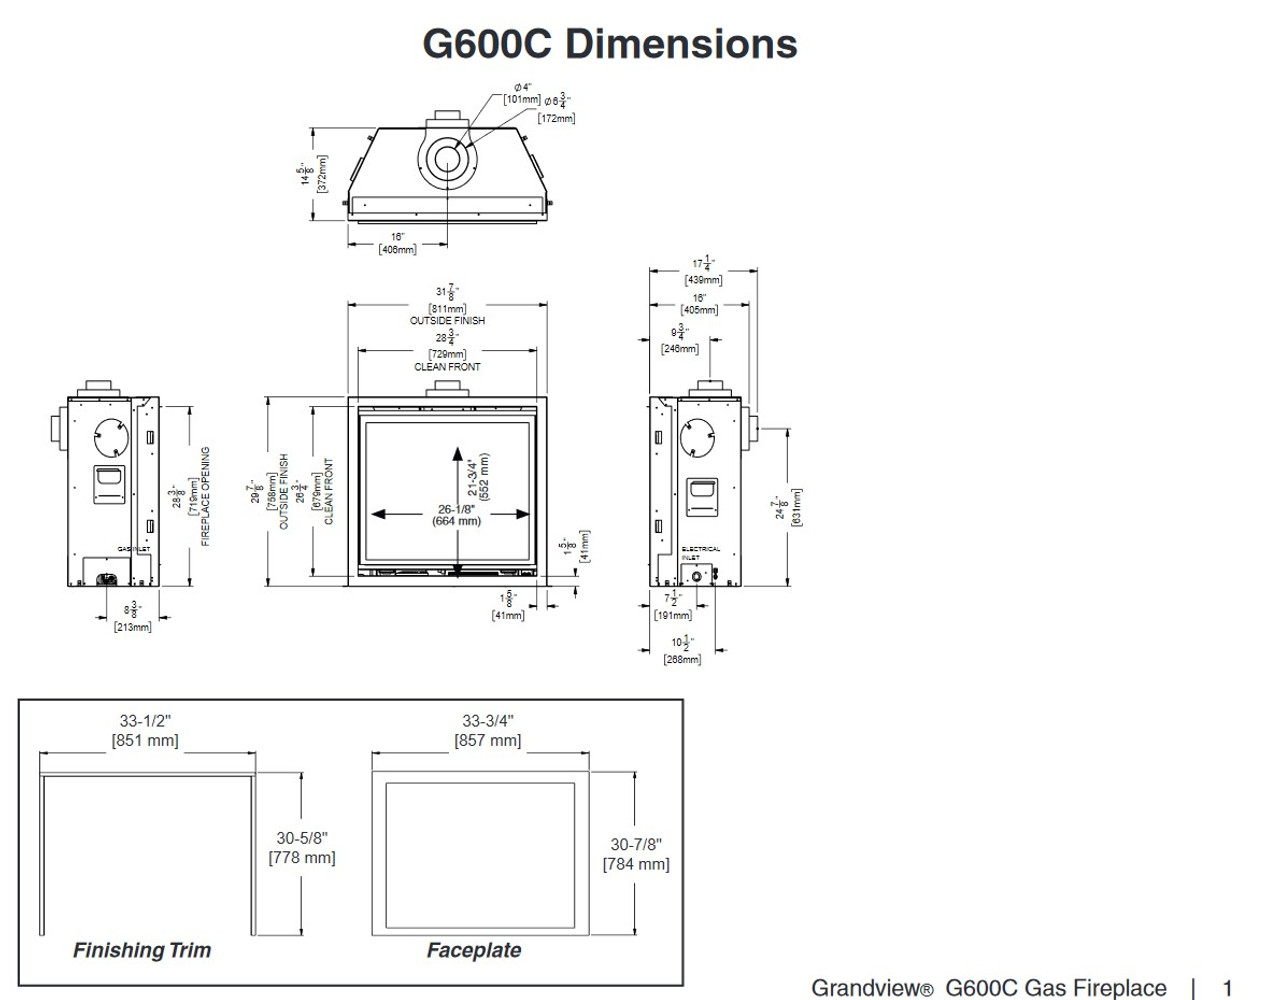 Regency Grandview G600EC Gas Fireplace